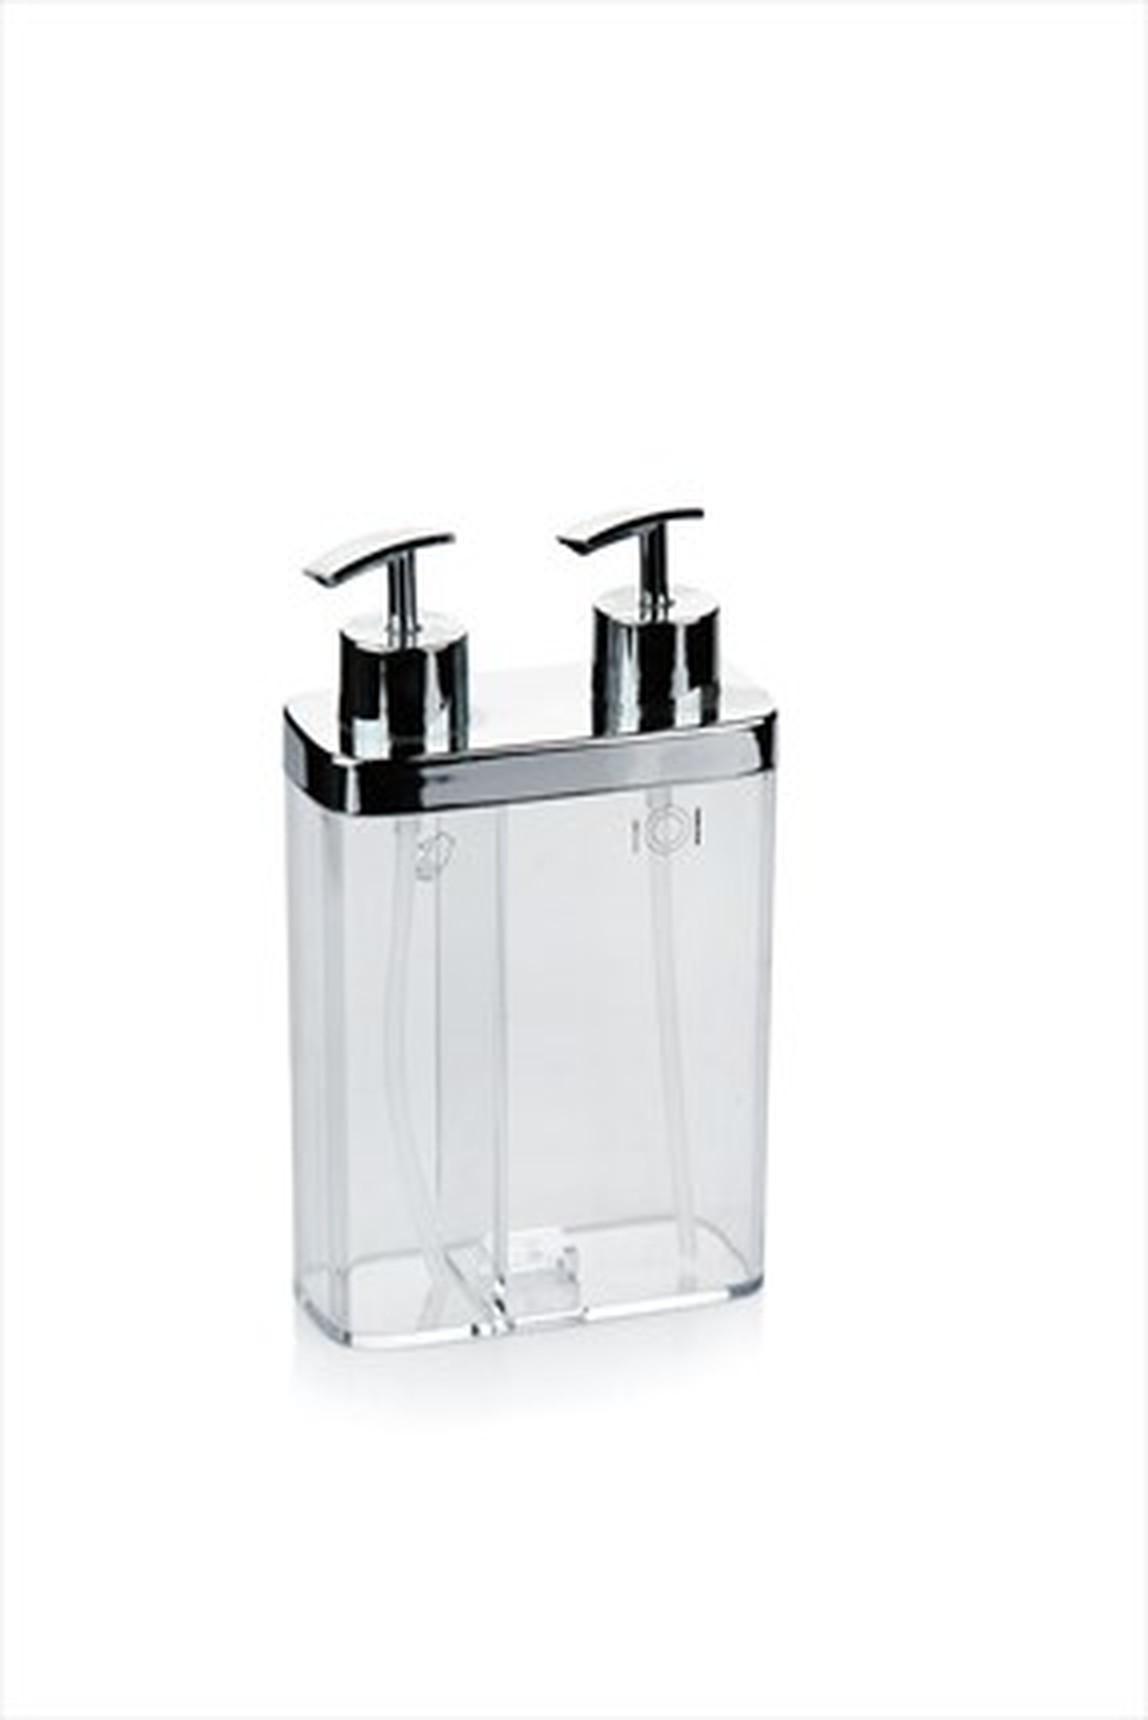 Viva Sıvı Sabunluk Seffaf Krom